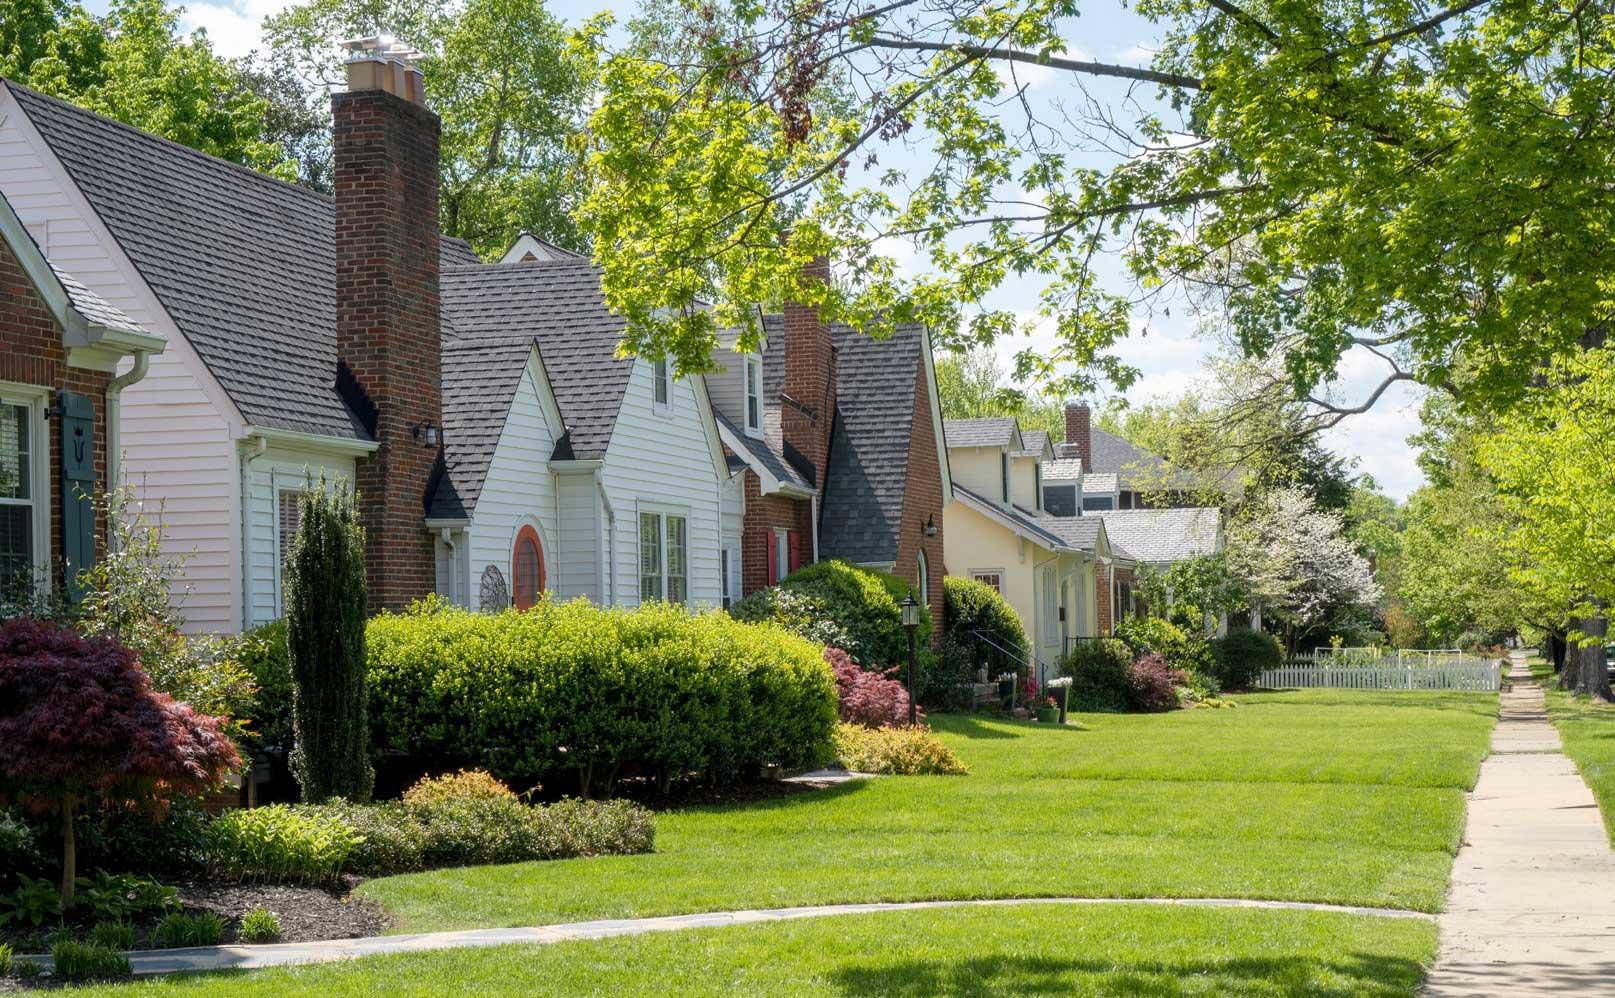 neighbourhood with homes for sale